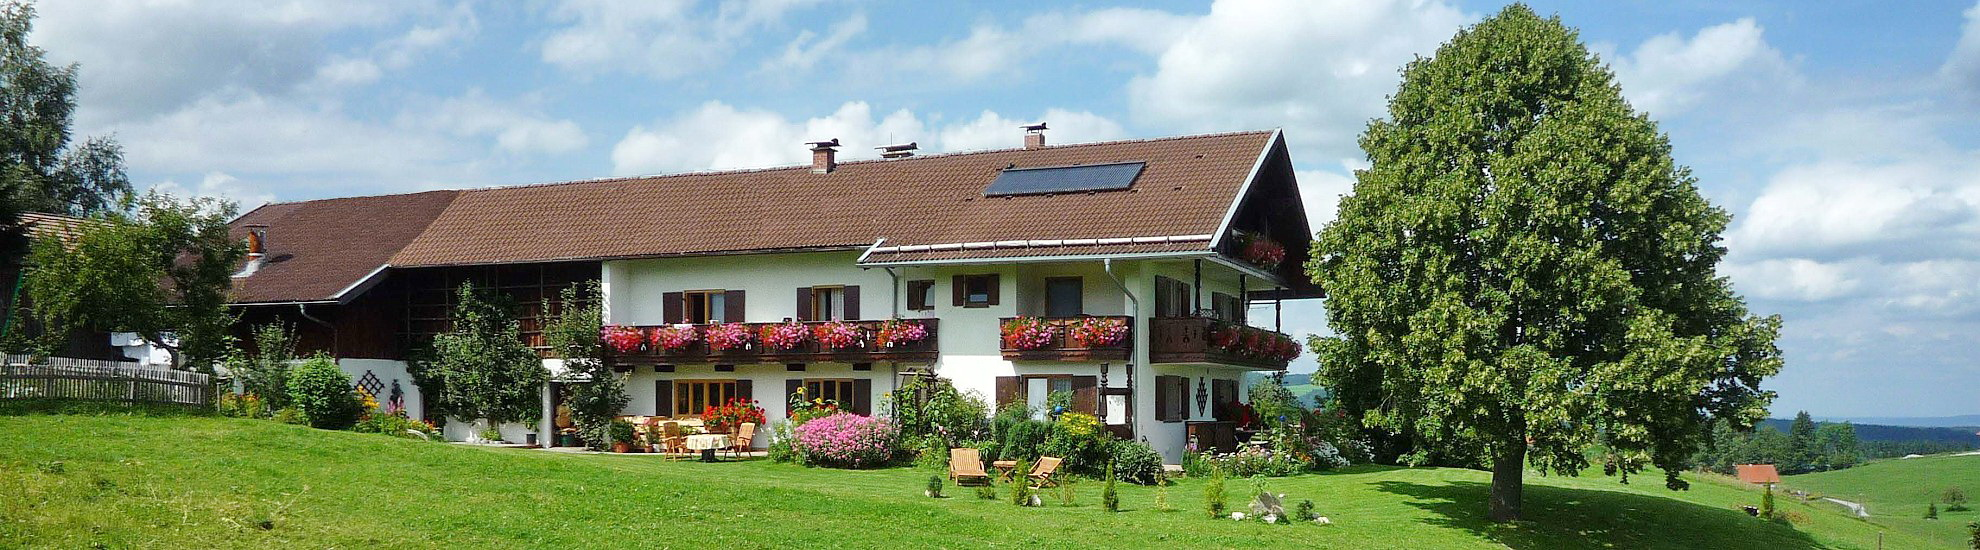 Haus Sperl